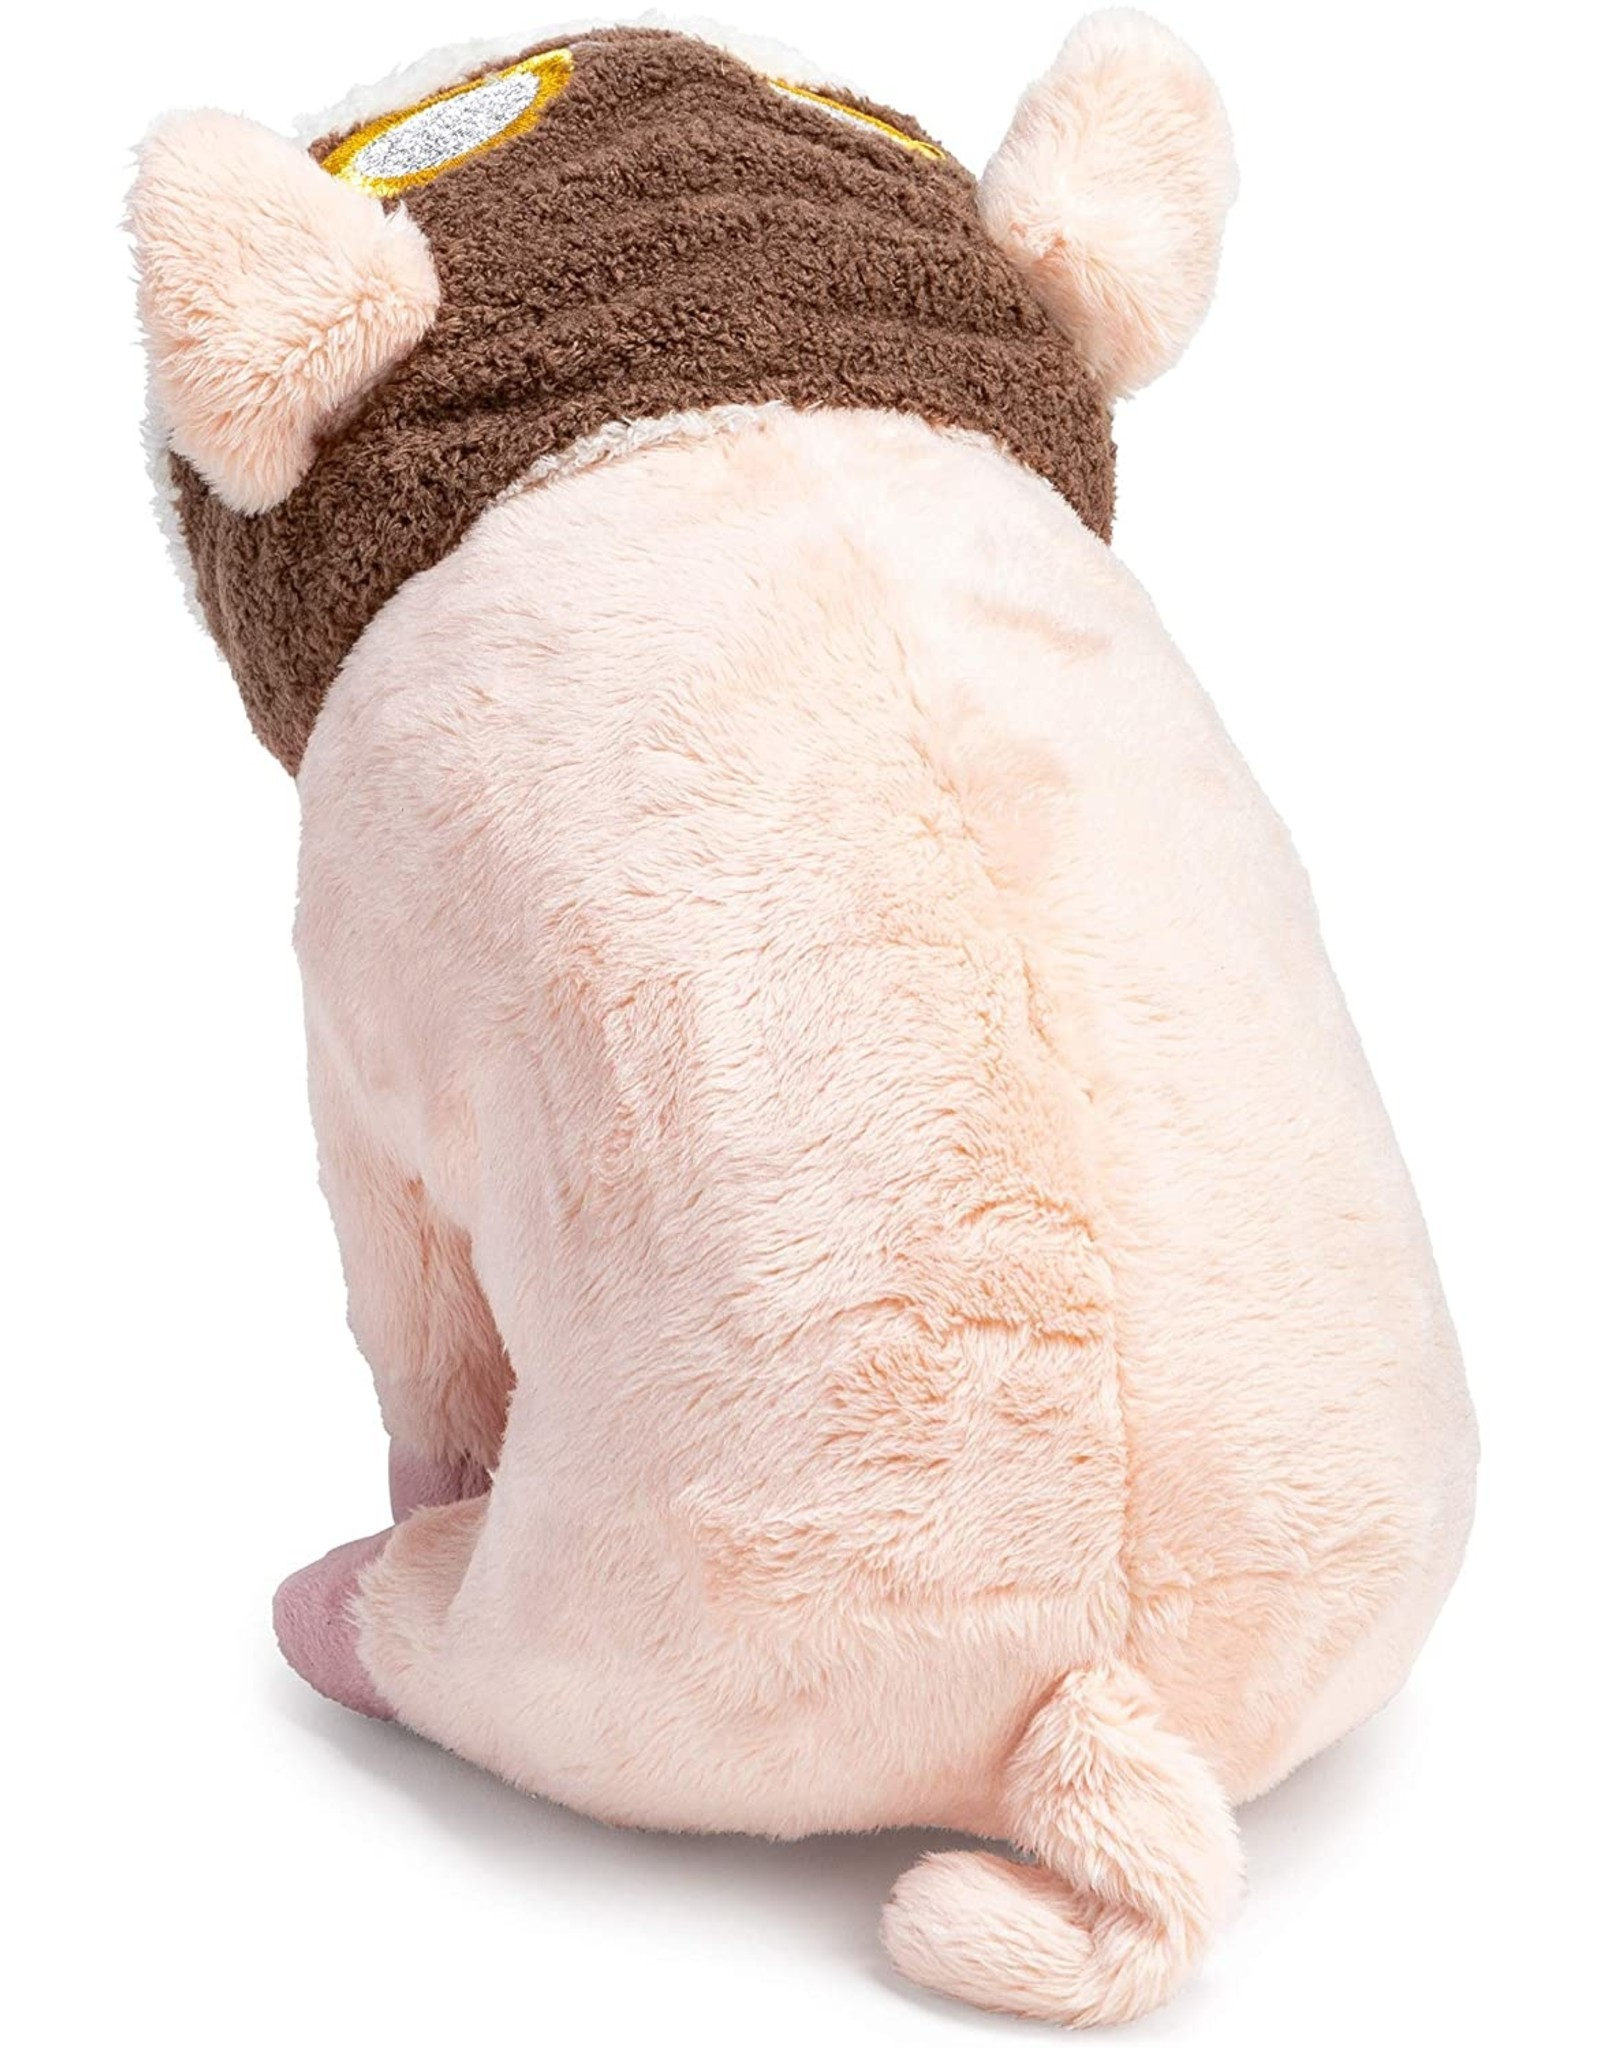 Compendium Flying Pig Plush - Maybe